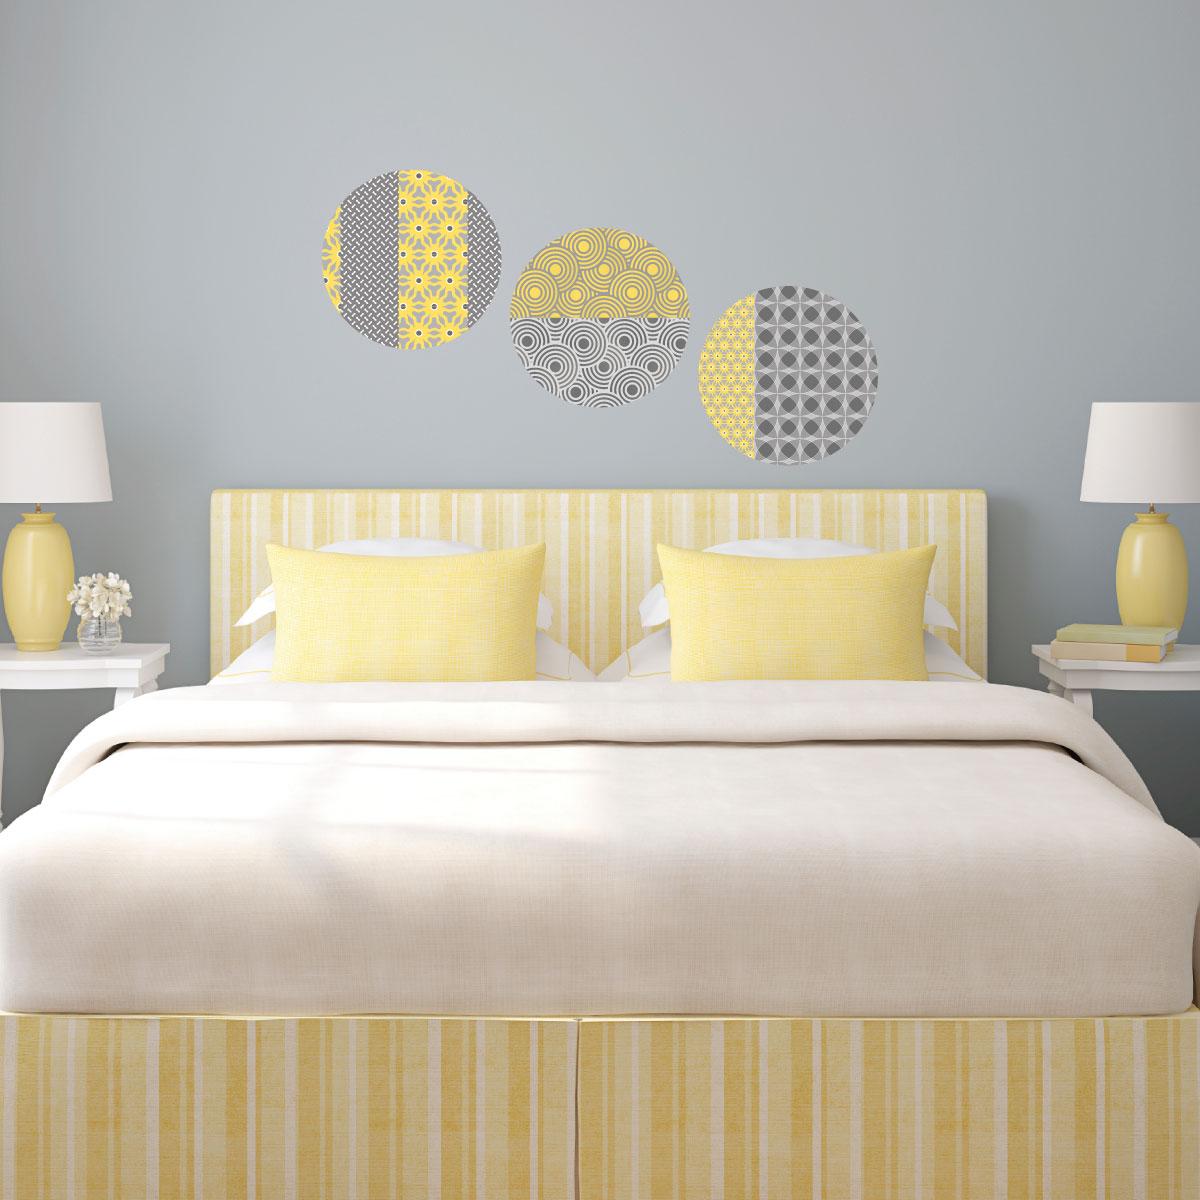 sticker 3 ronds d coratifs jaune et gris stickers art et design ambiance sticker. Black Bedroom Furniture Sets. Home Design Ideas